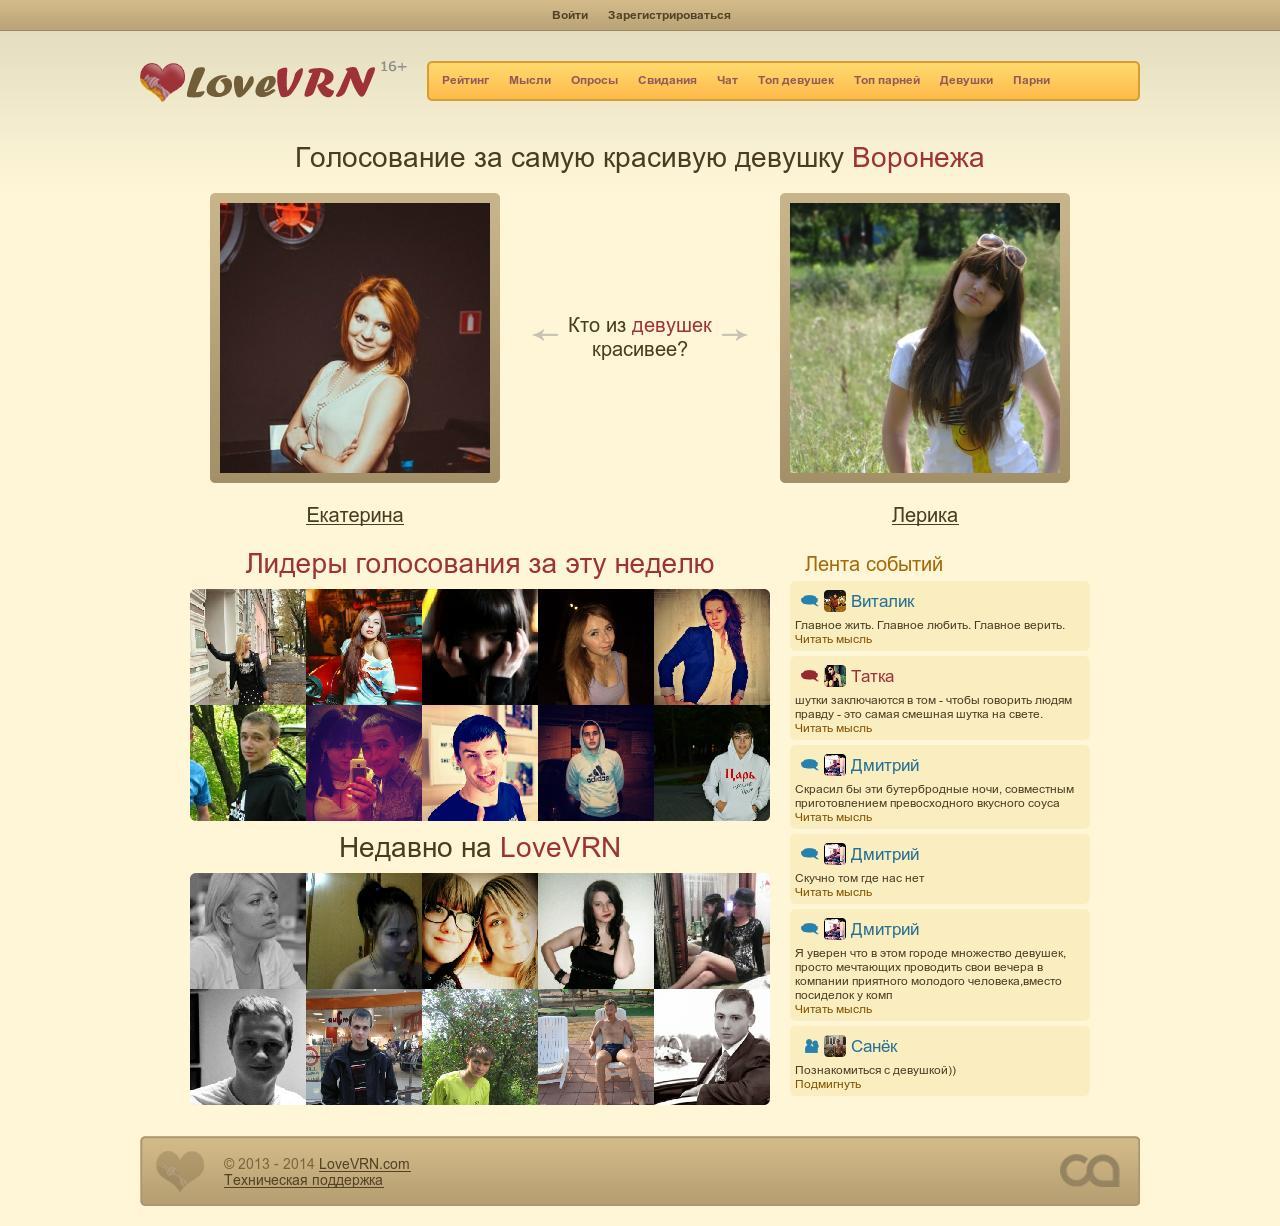 Верстка сайта знакомств LoveVRN